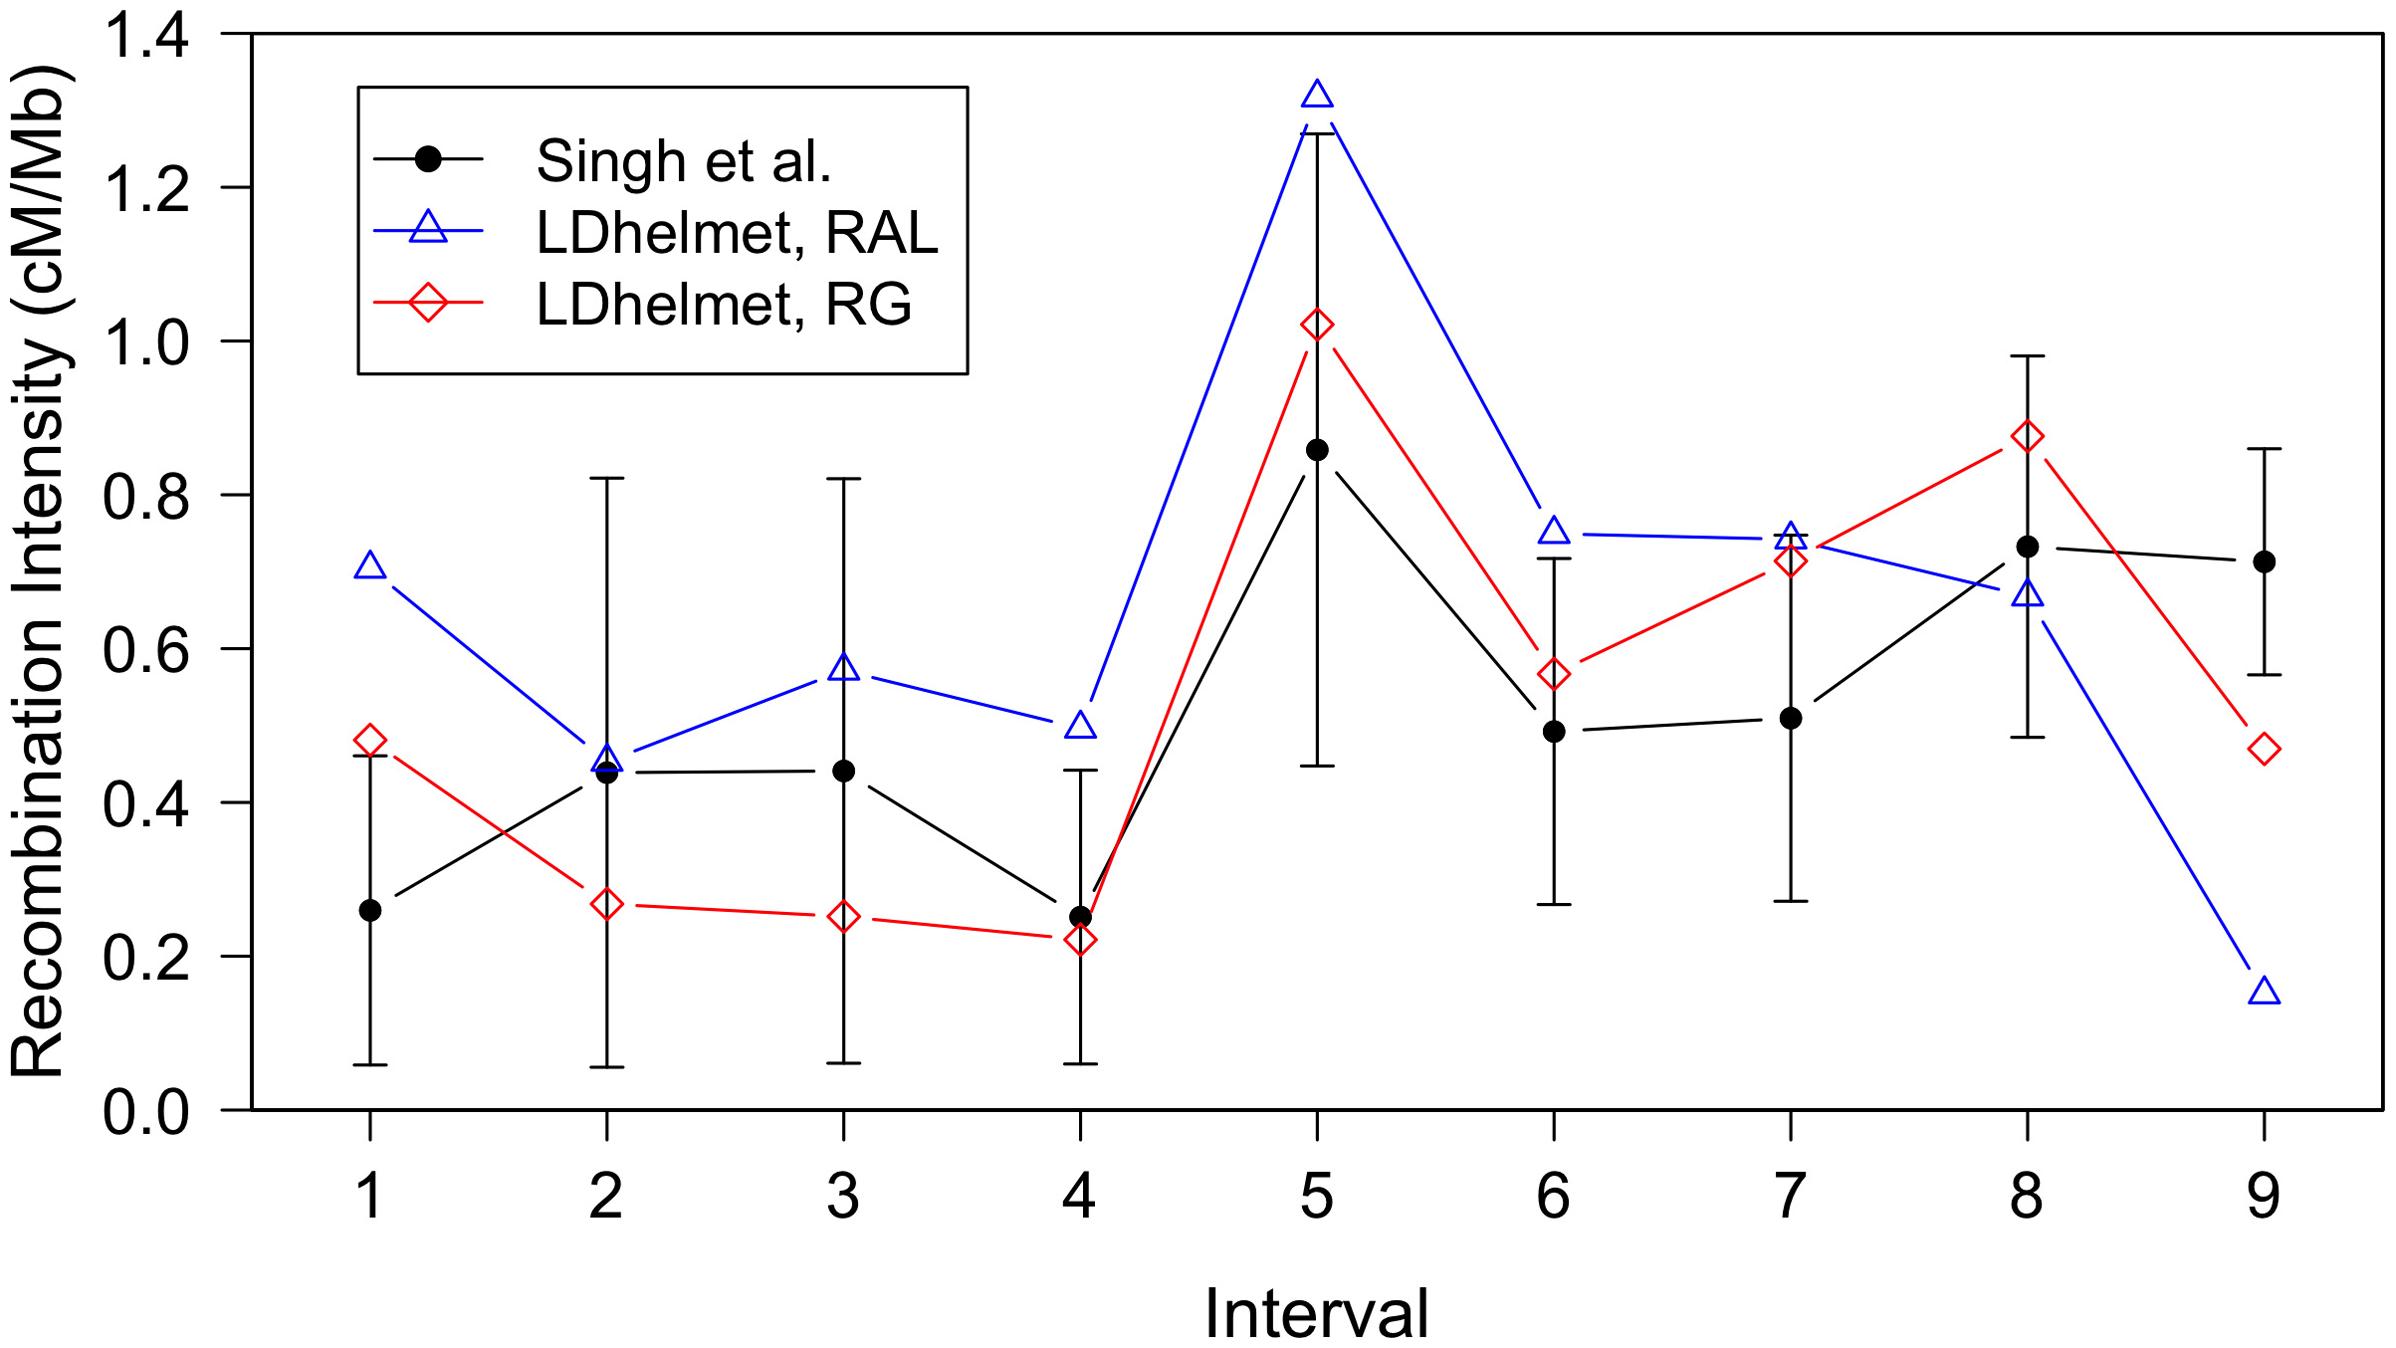 Comparison of LDhelmet estimates to the empirical genetic map of Singh <i>et al</i>.